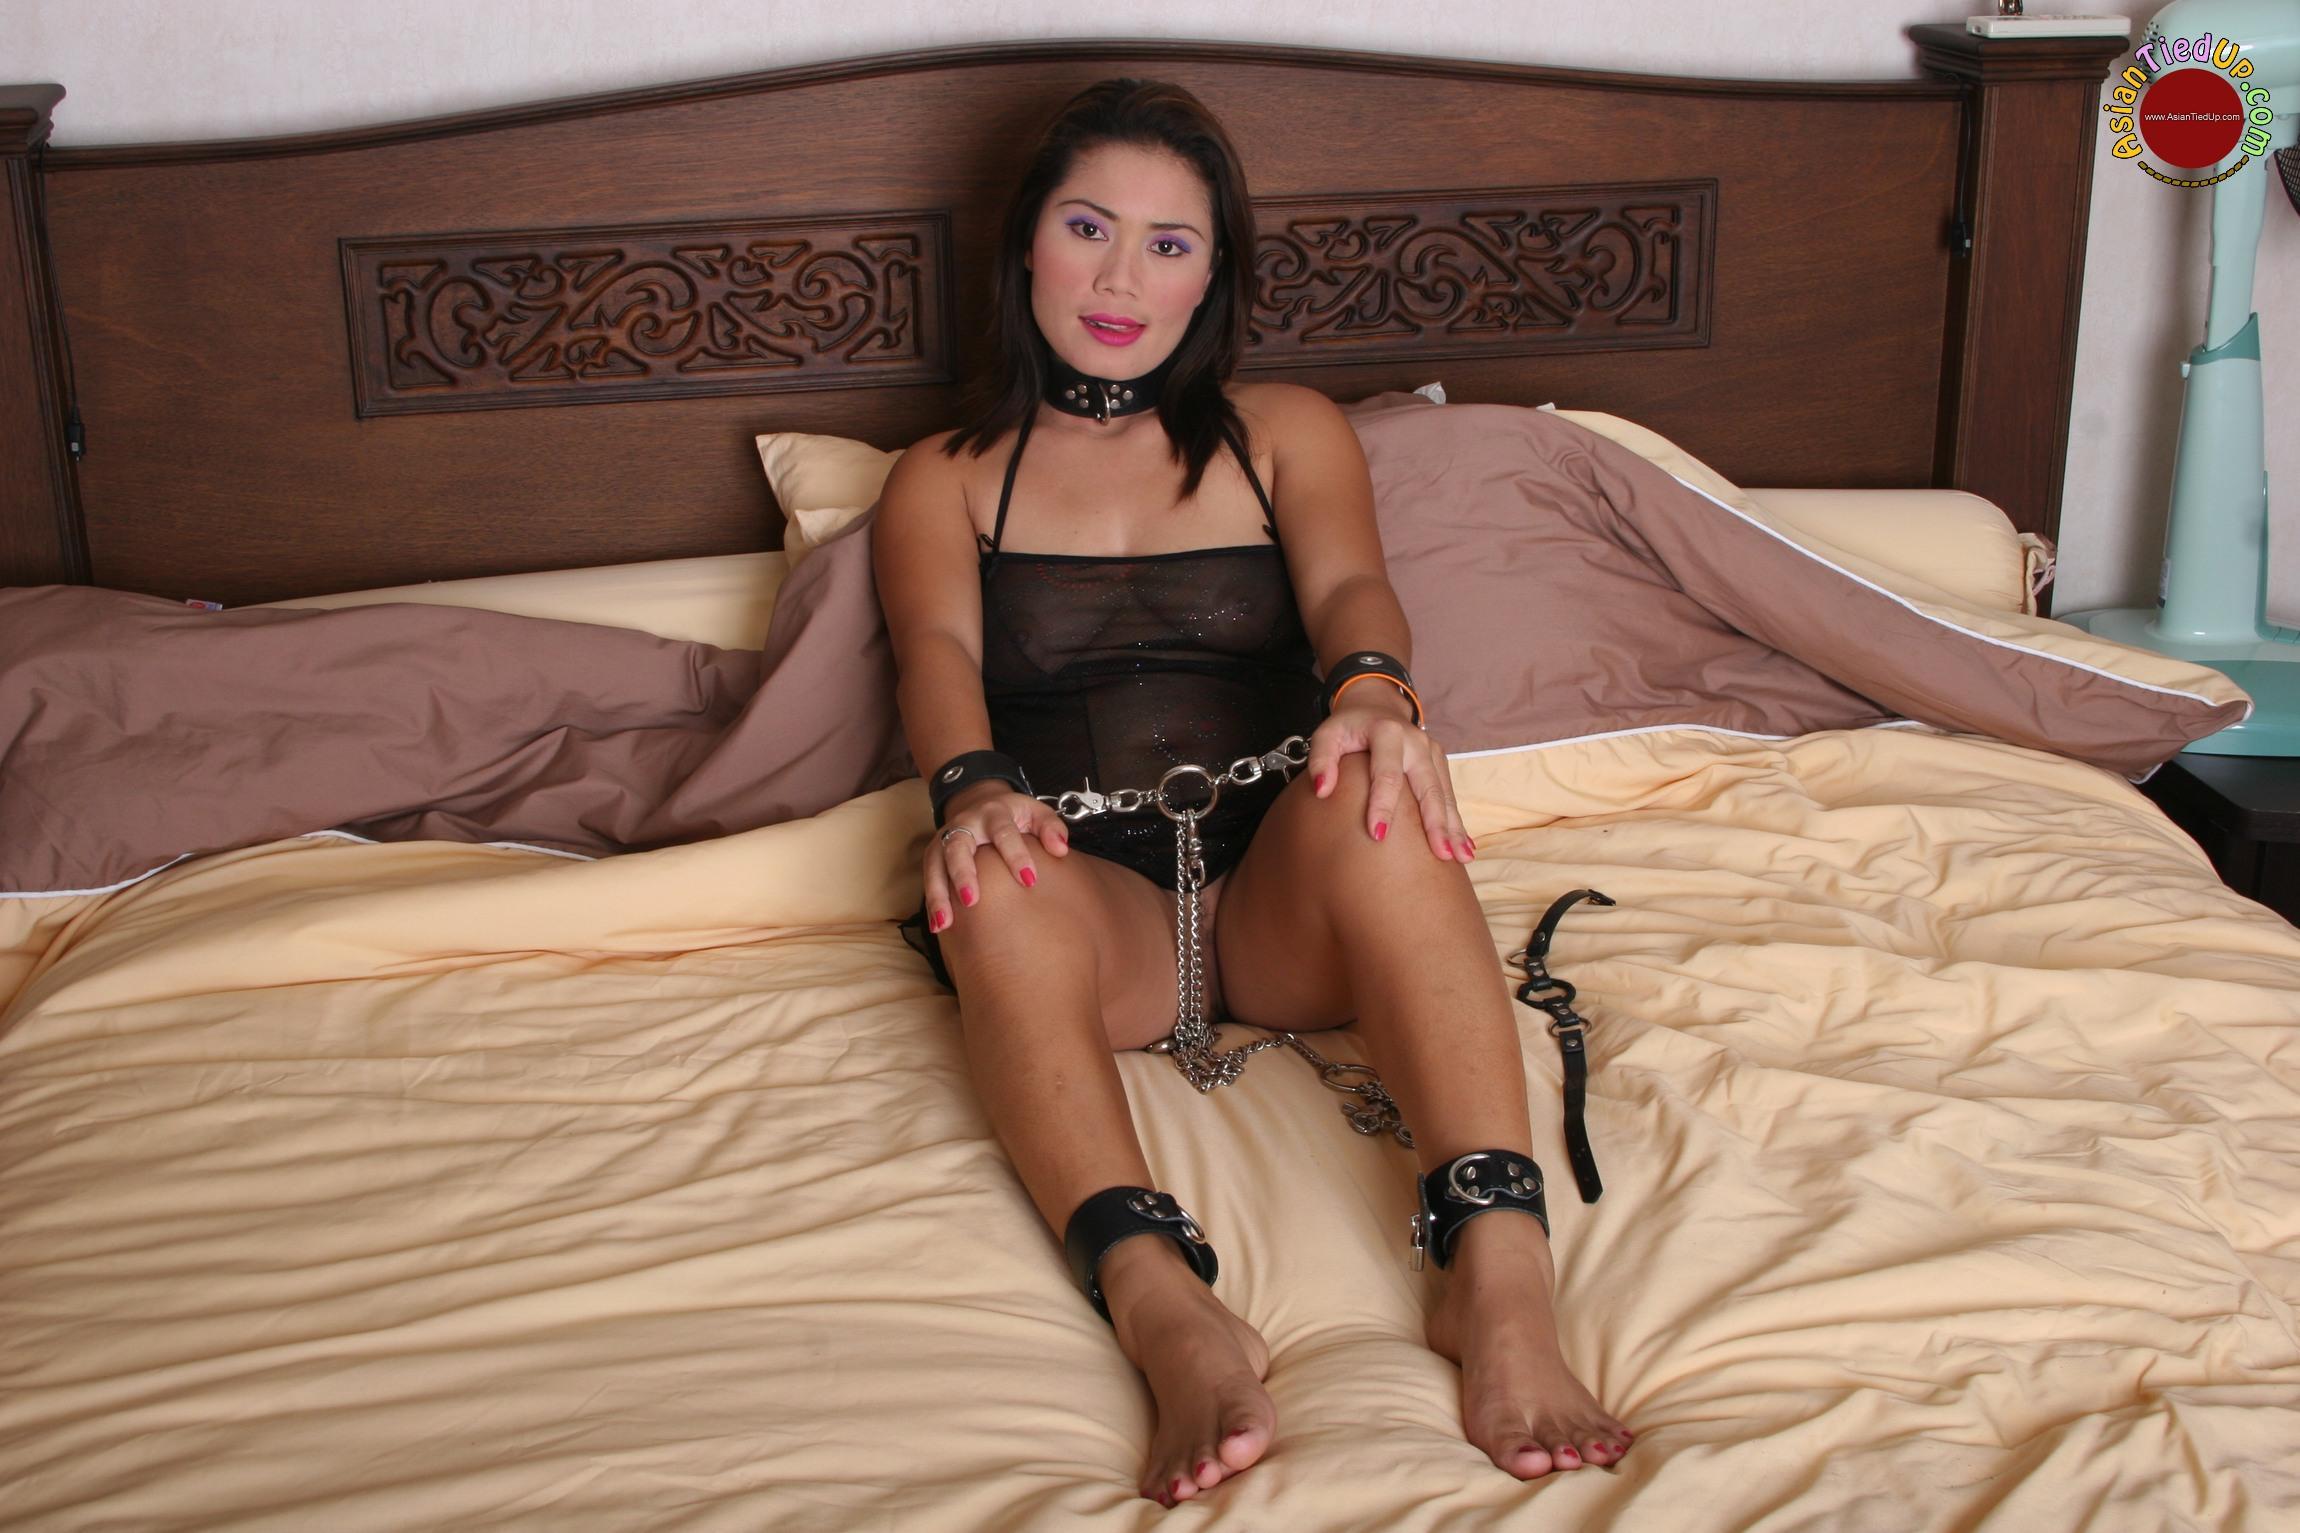 Brazilian pornstars babes nude pics